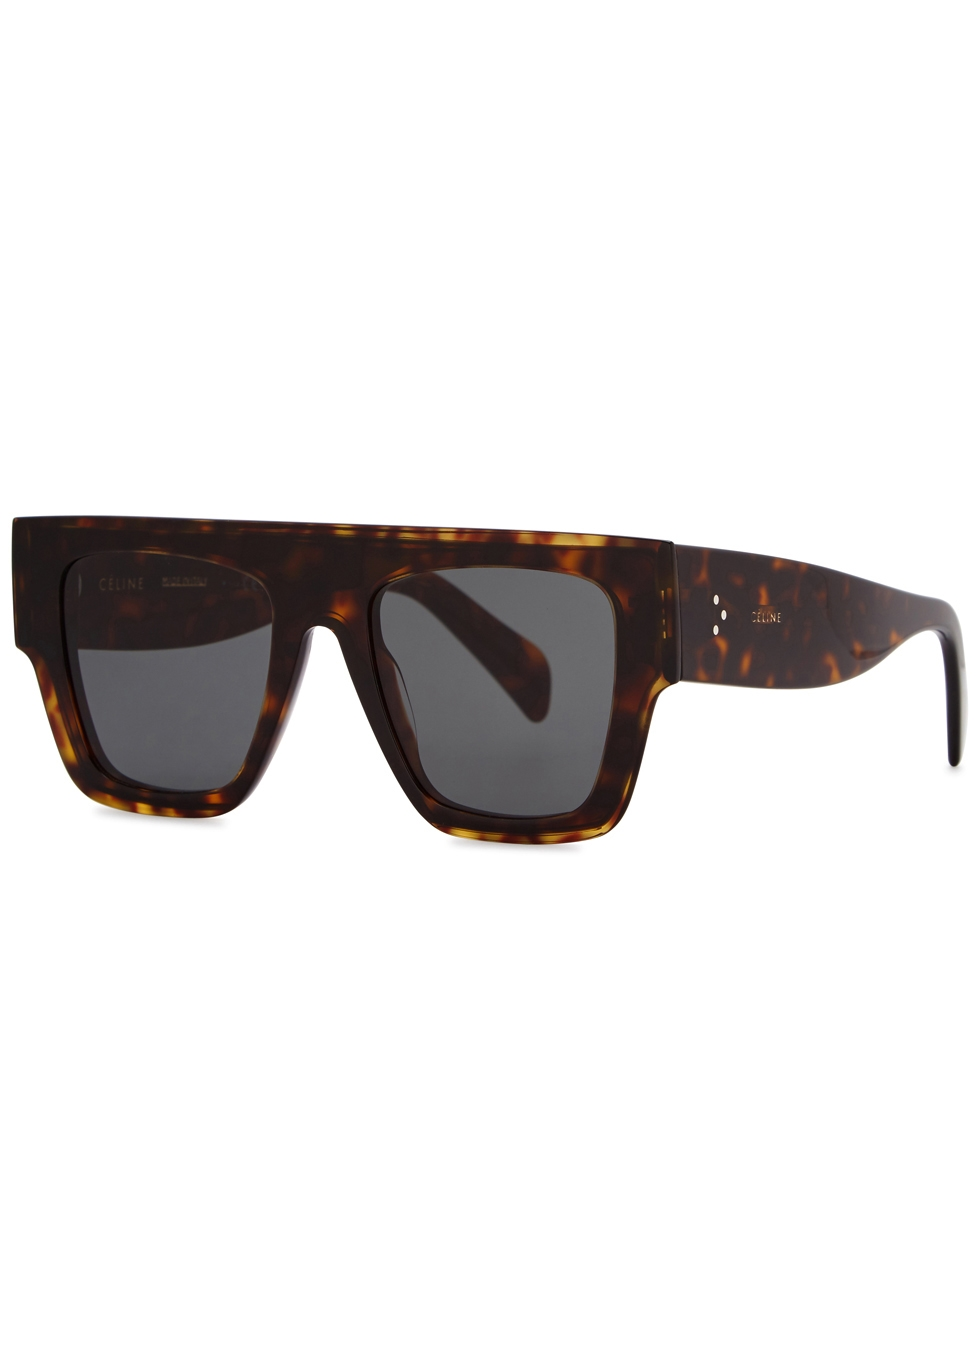 cf8590276353 Celine Tortoiseshell D-frame sunglasses - Harvey Nichols